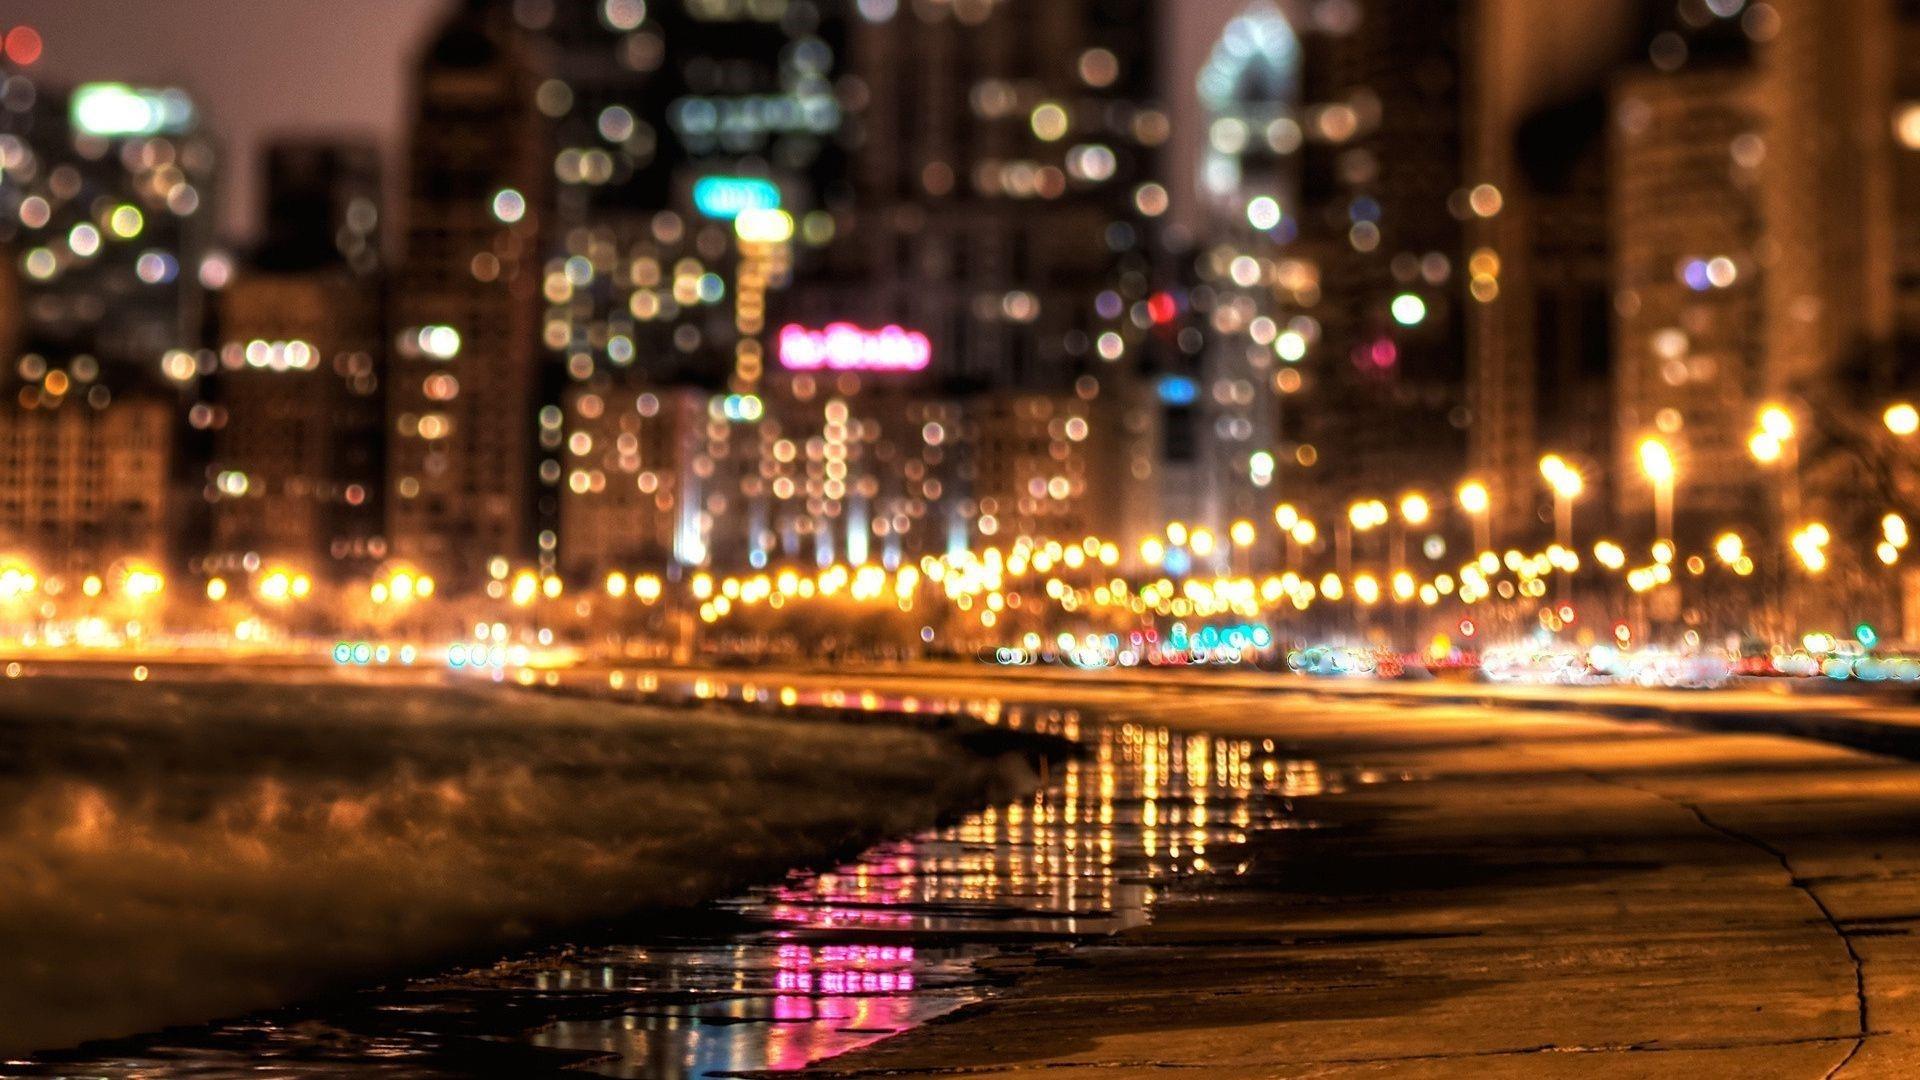 night city lights wallpaper | wallpaper studio 10 | tens of